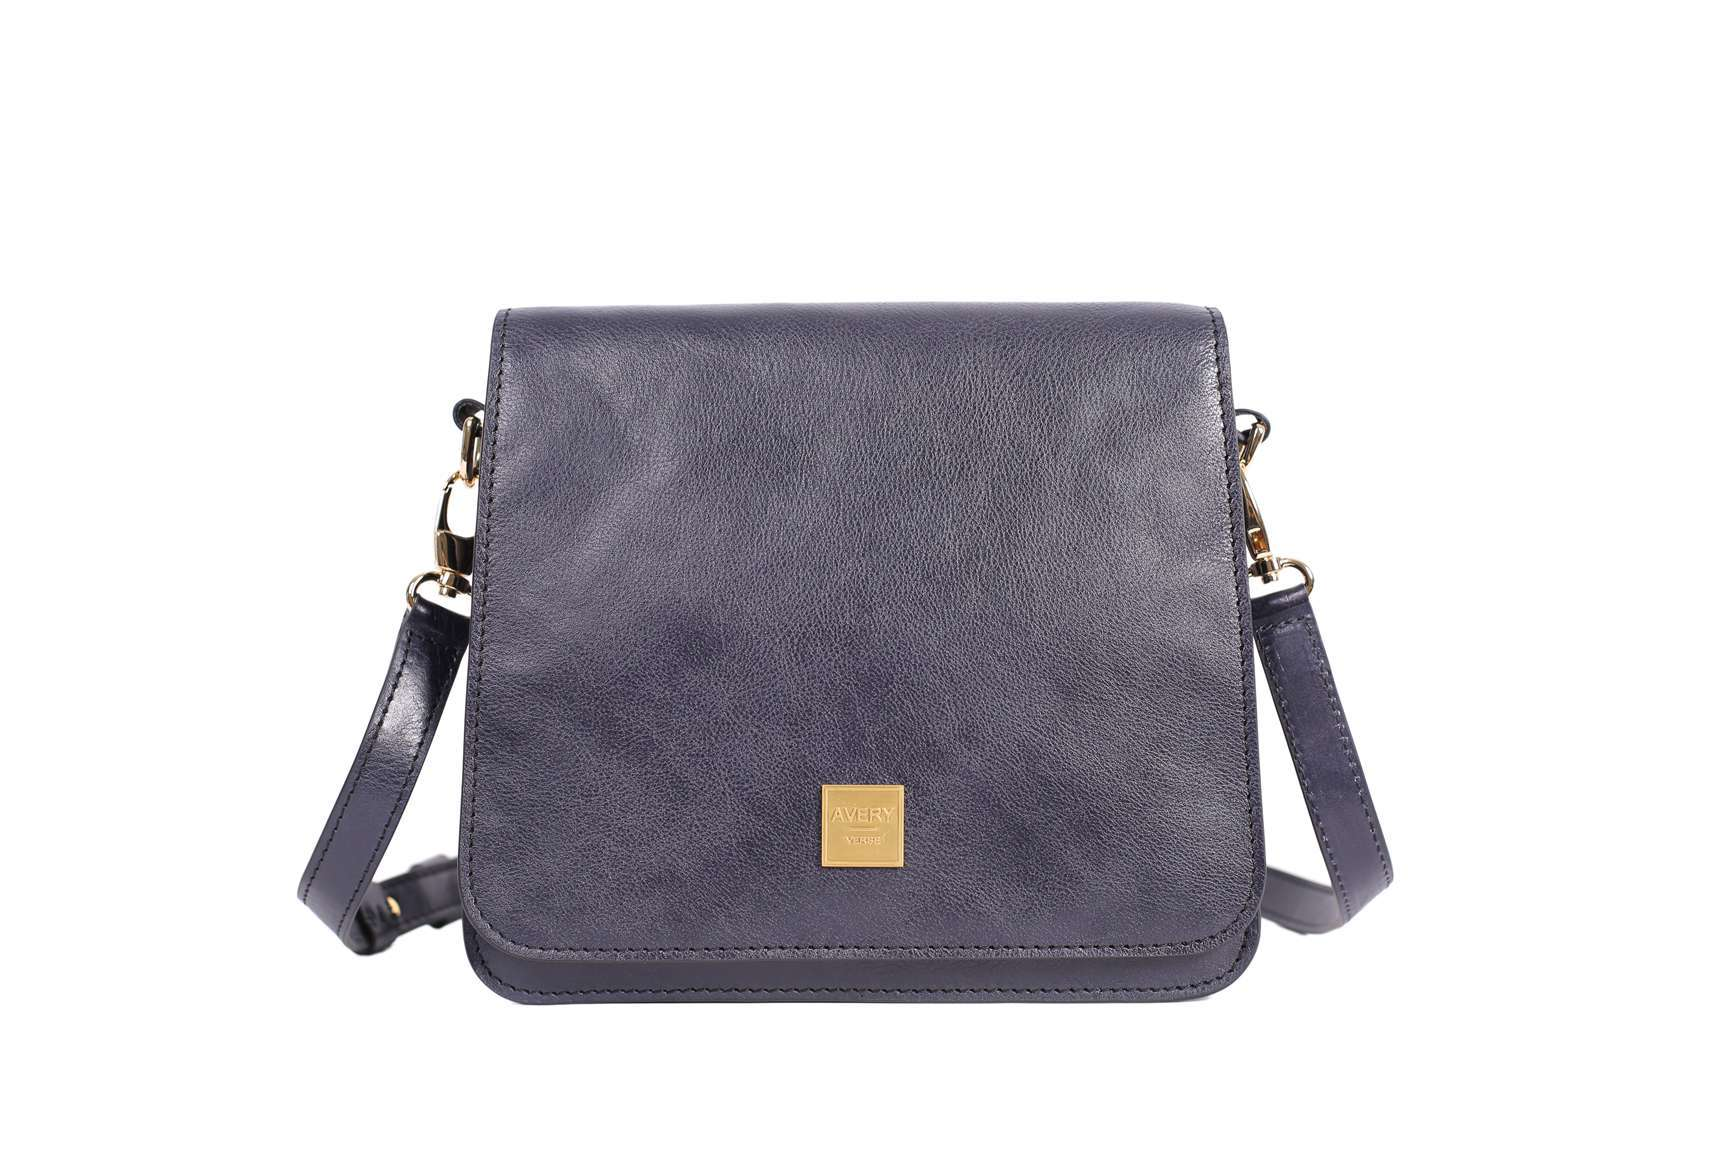 The Urban Stroll Shoulder Bag in Blue Italian Leather